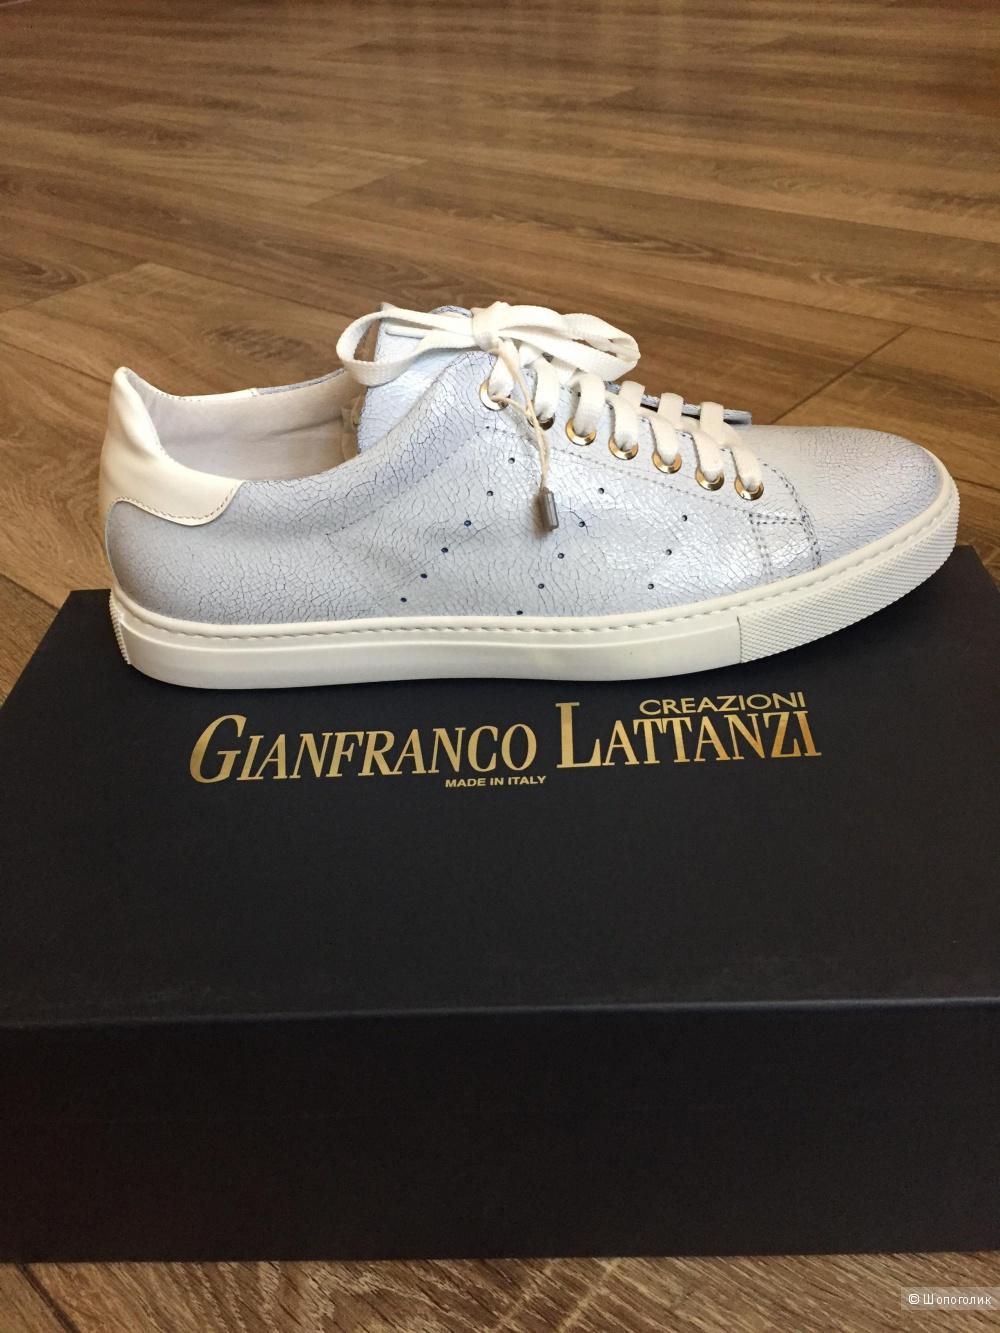 Кроссовки  GIANFRANCO LATTANZI,размер 38(Европейский)